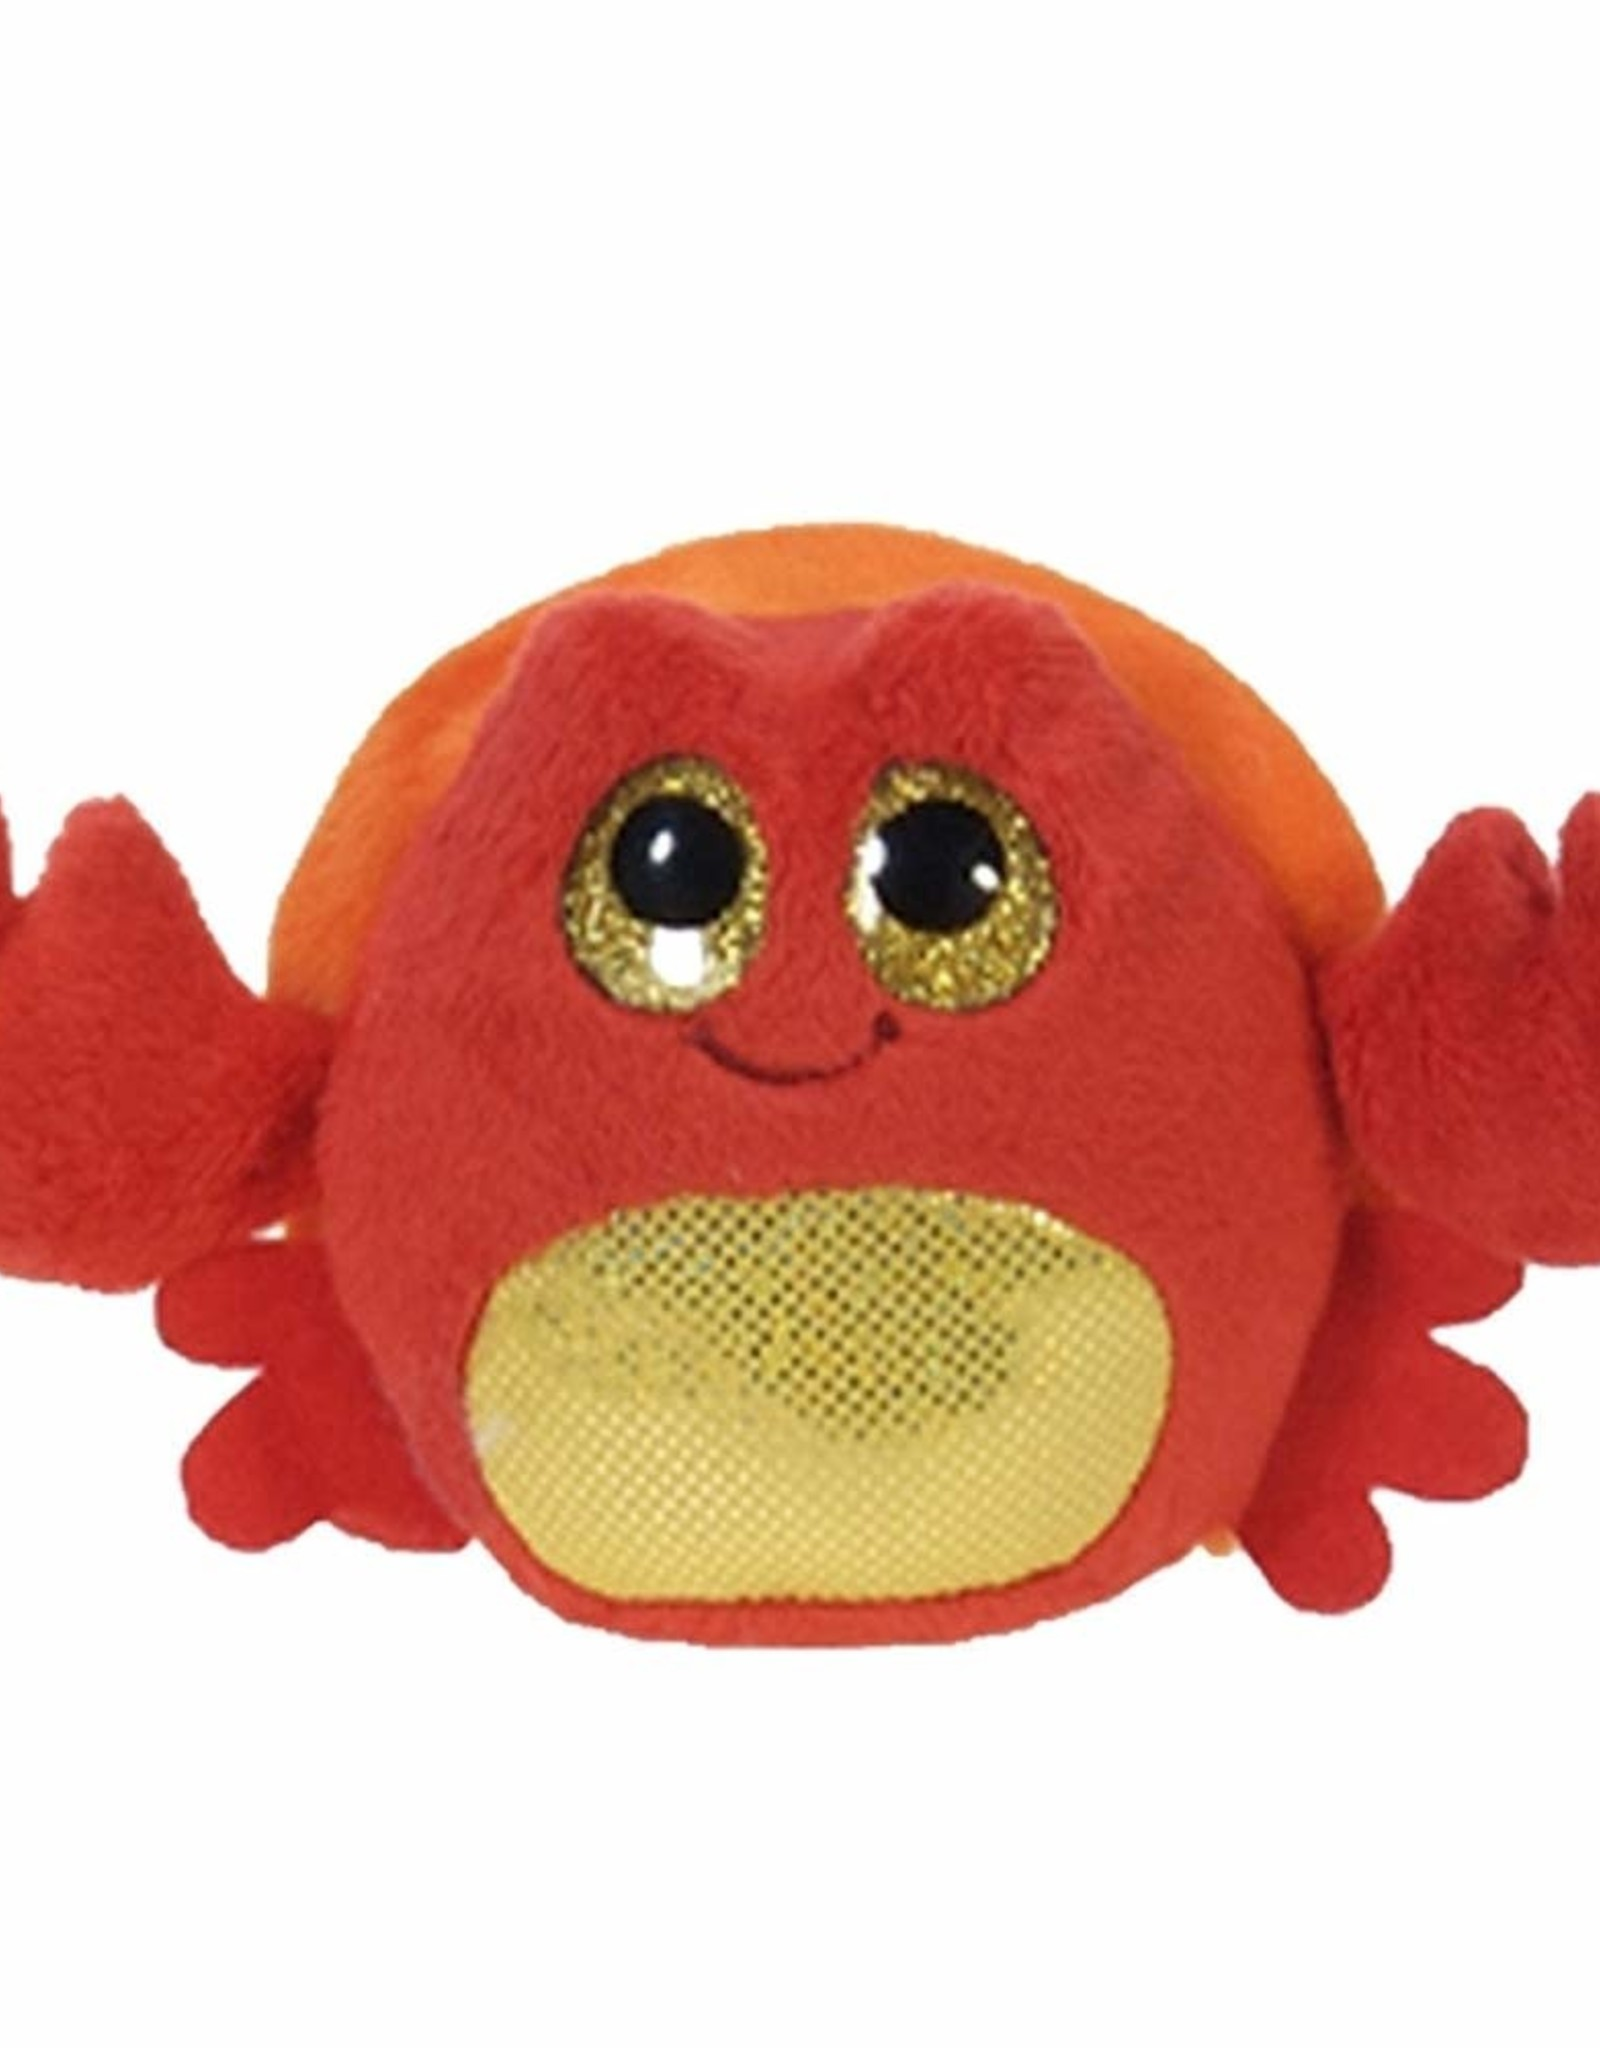 Fiesta Toys Lubby Cubby Crab